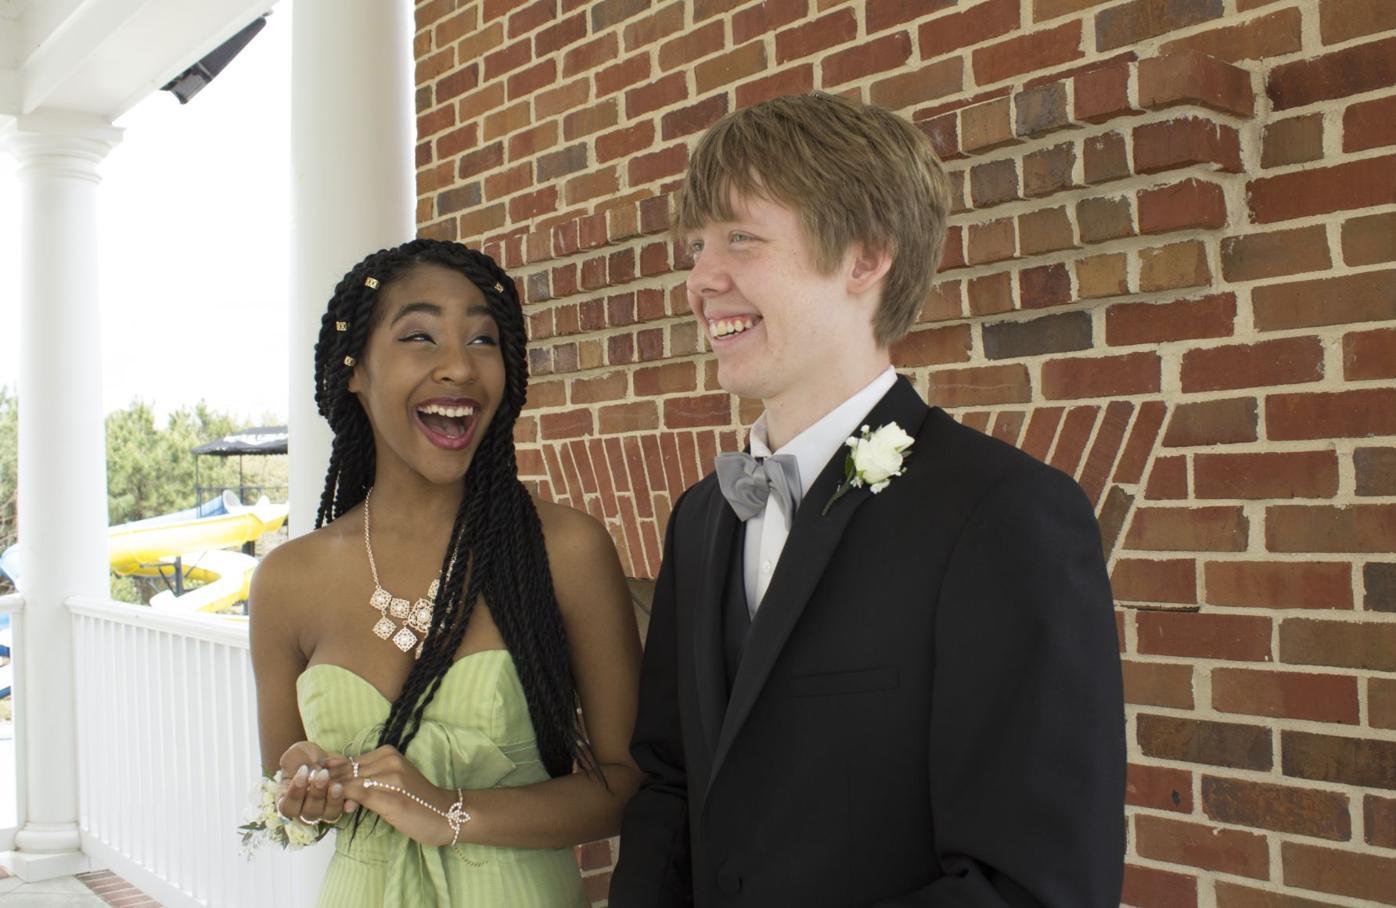 Prom giveaway 1.jpg